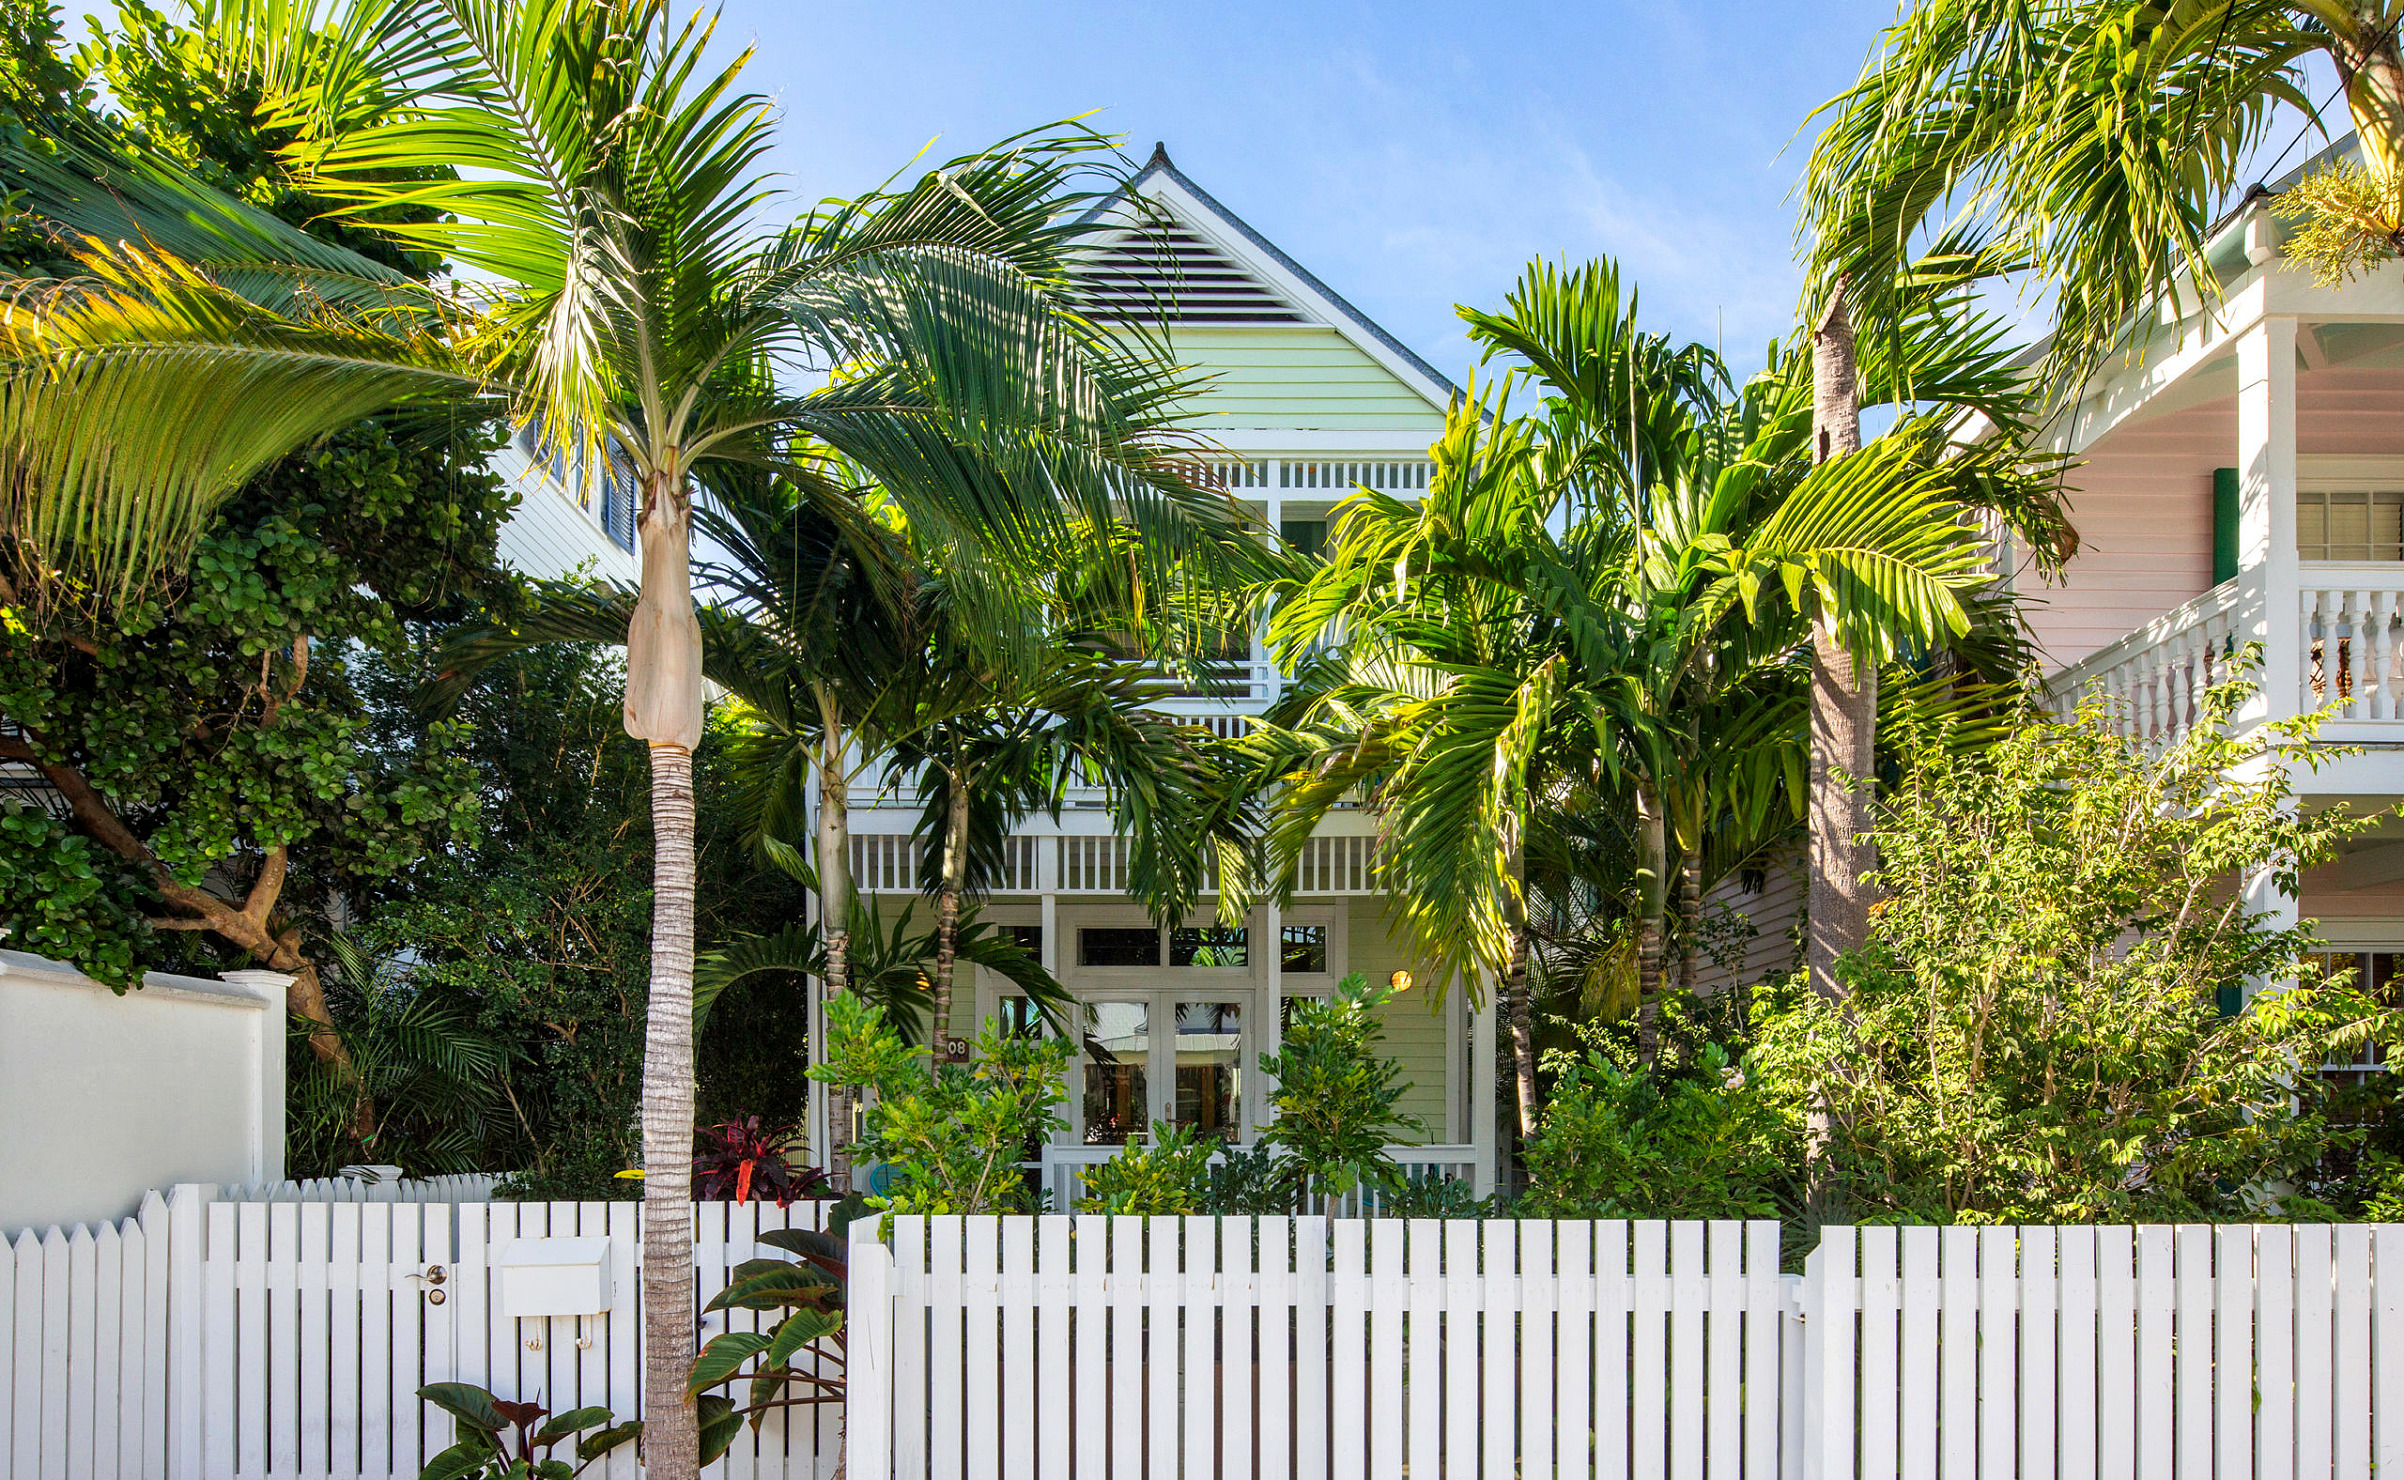 808 Ashe St, Key West - The Spanish Lime House